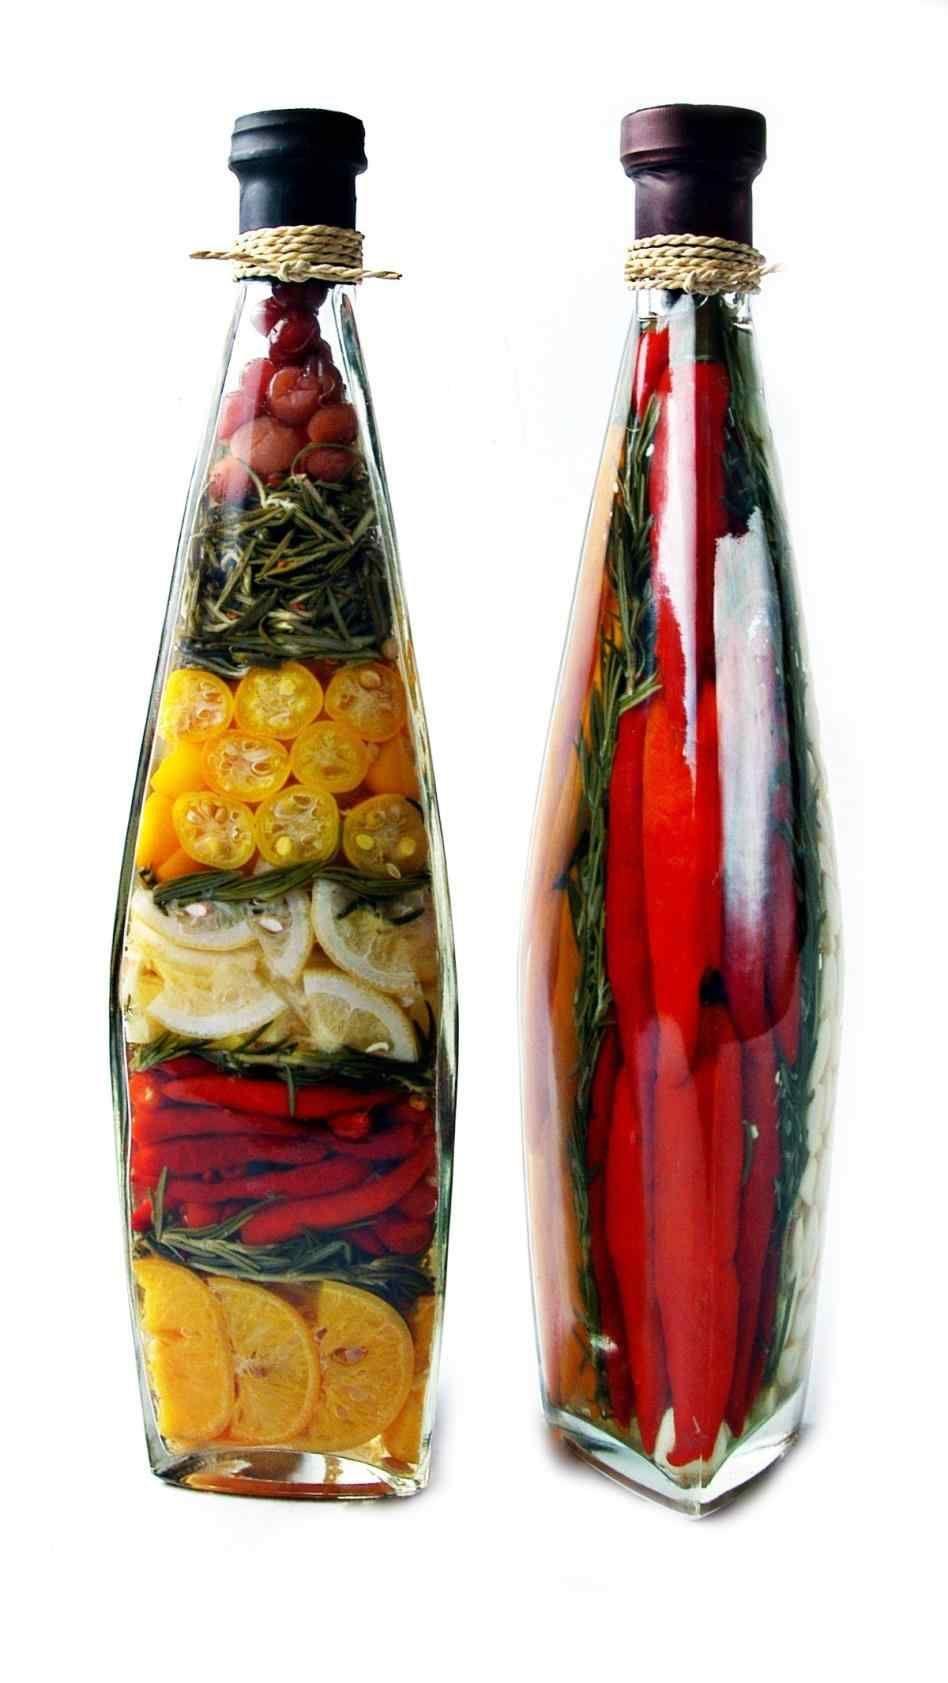 15 Best And Wonderful Bottle Decoration Ideas For Your Kitchen Breakpr Bottles Decoration Italian Kitchen Decor Bottle